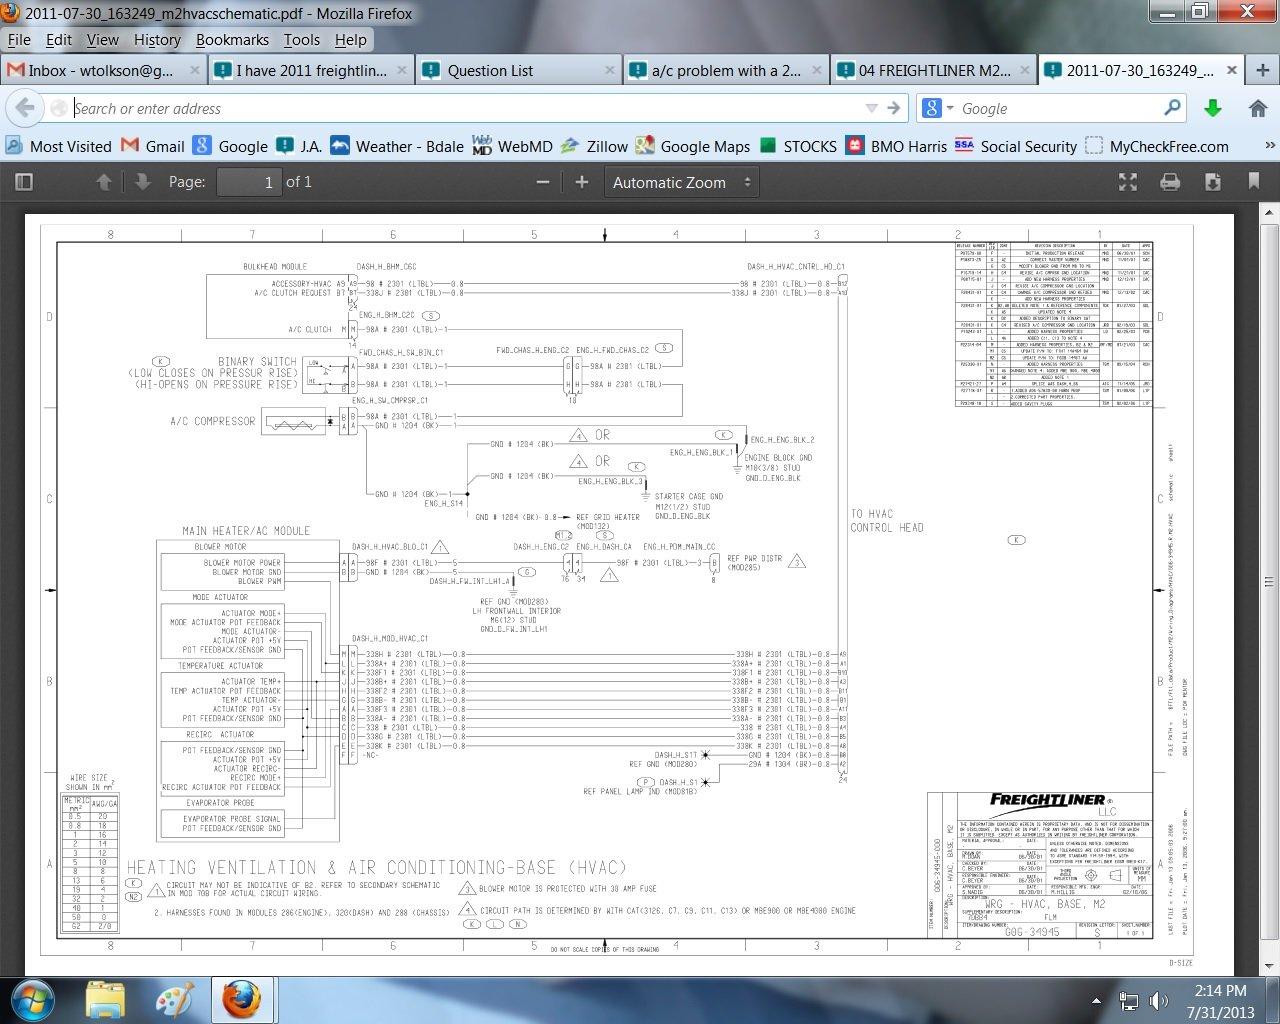 1999 freightliner fl60 fuse box diagram wiring schematics and 1999 freightliner fl80 fuse box diagram wiring diagrams base